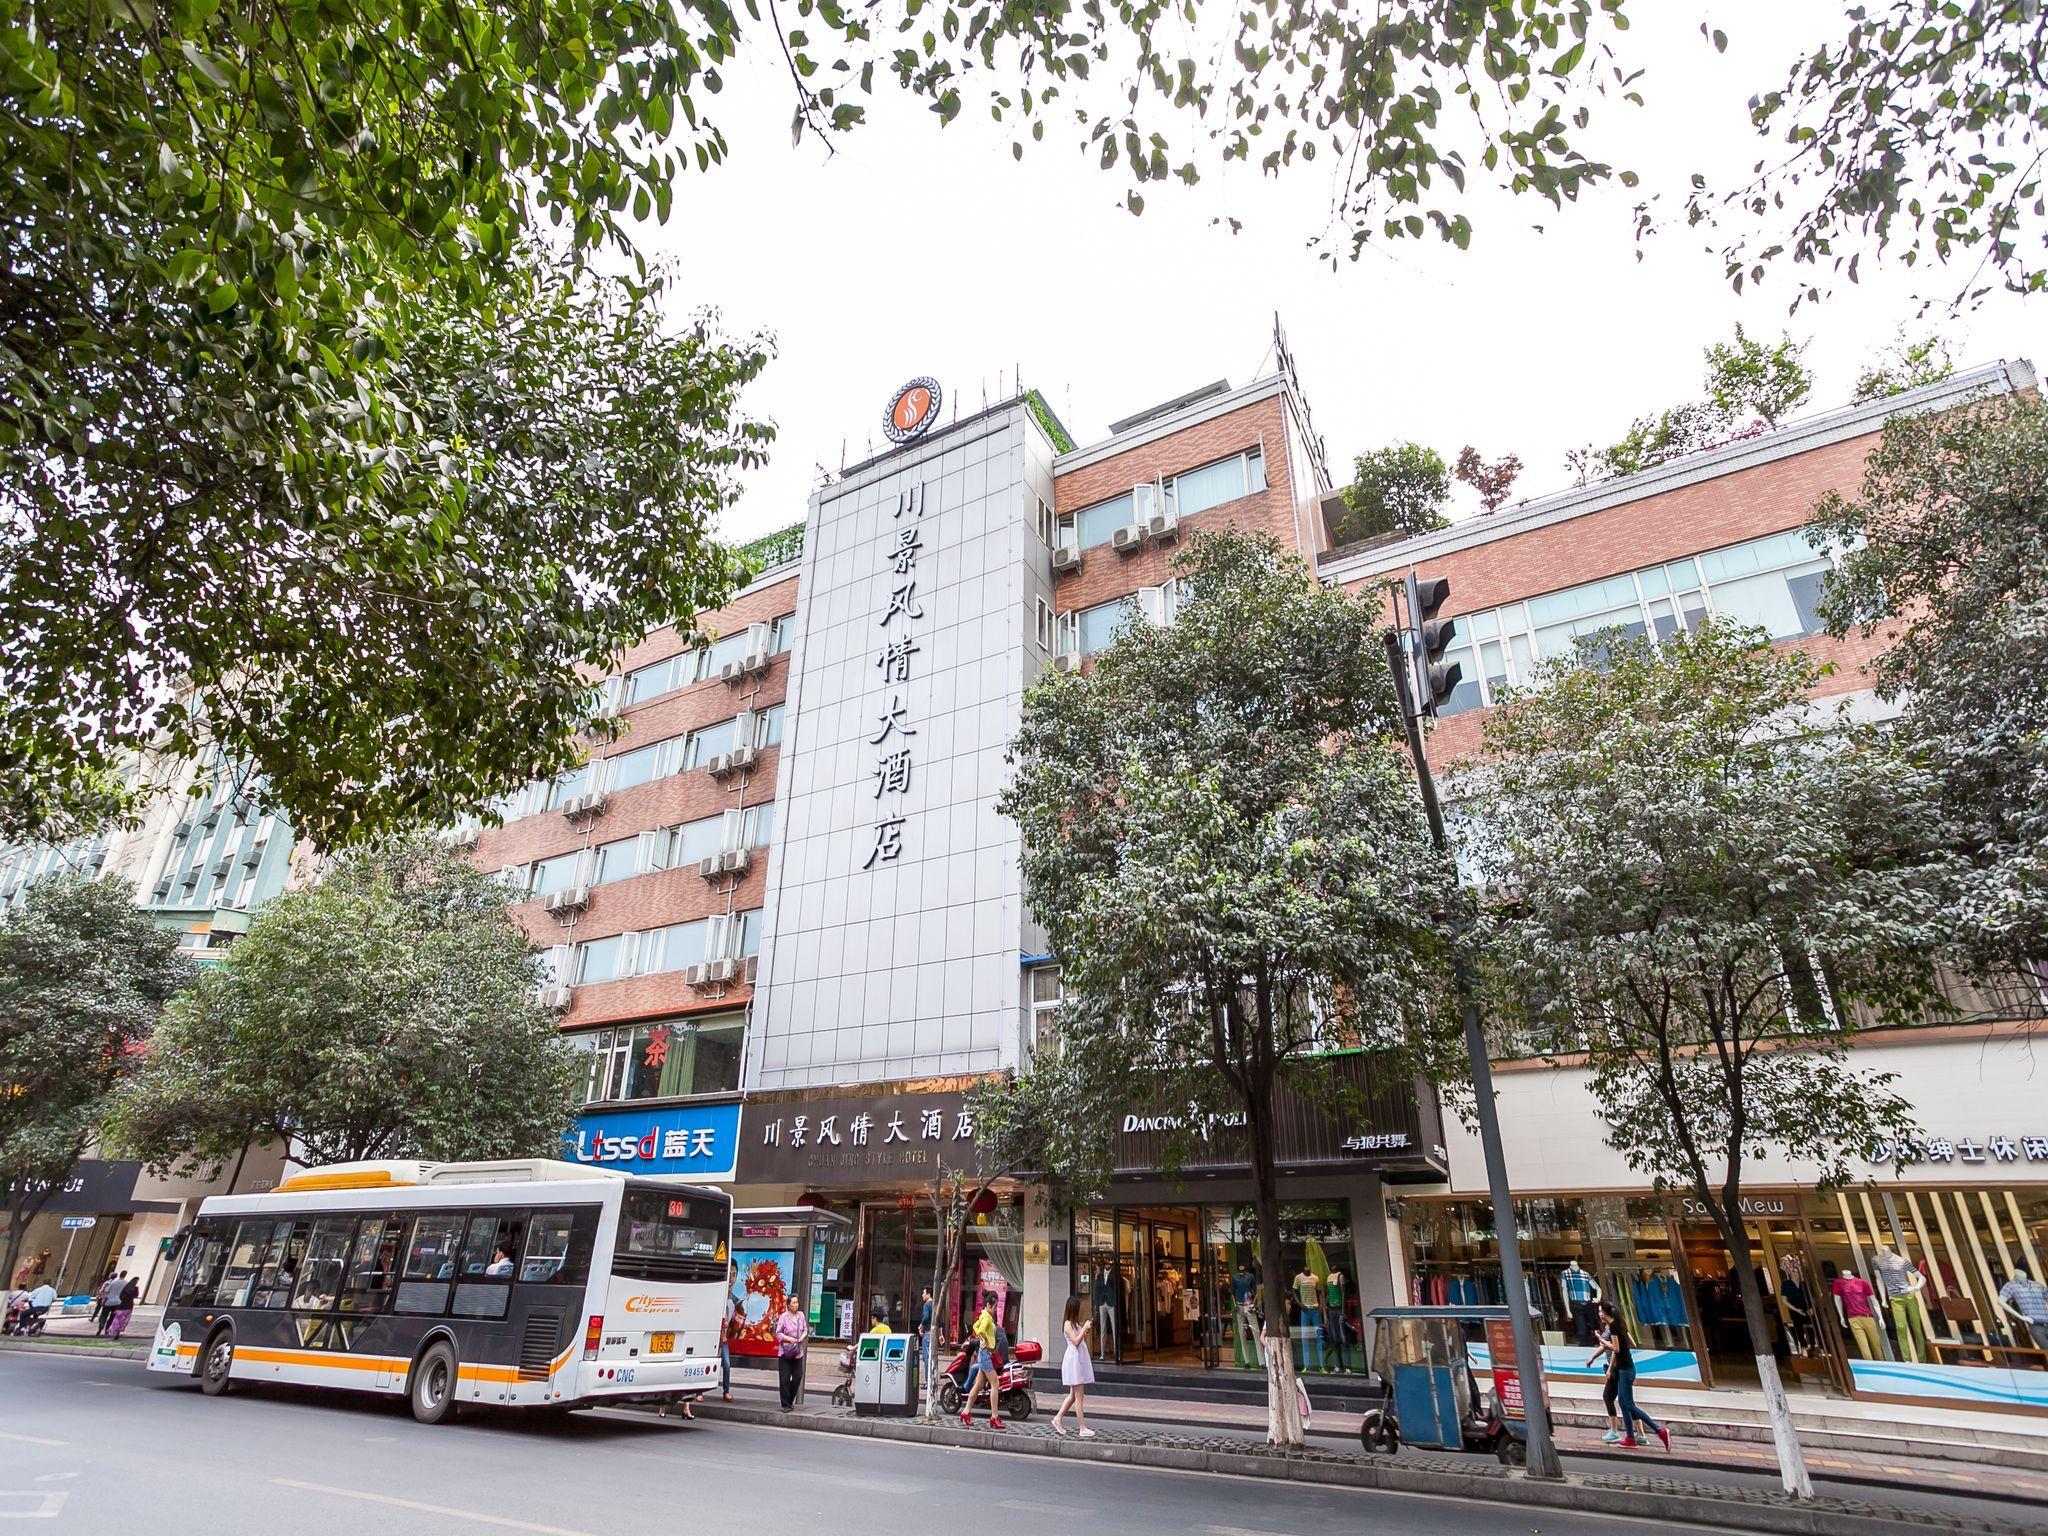 Chuan Jing Style Hotel